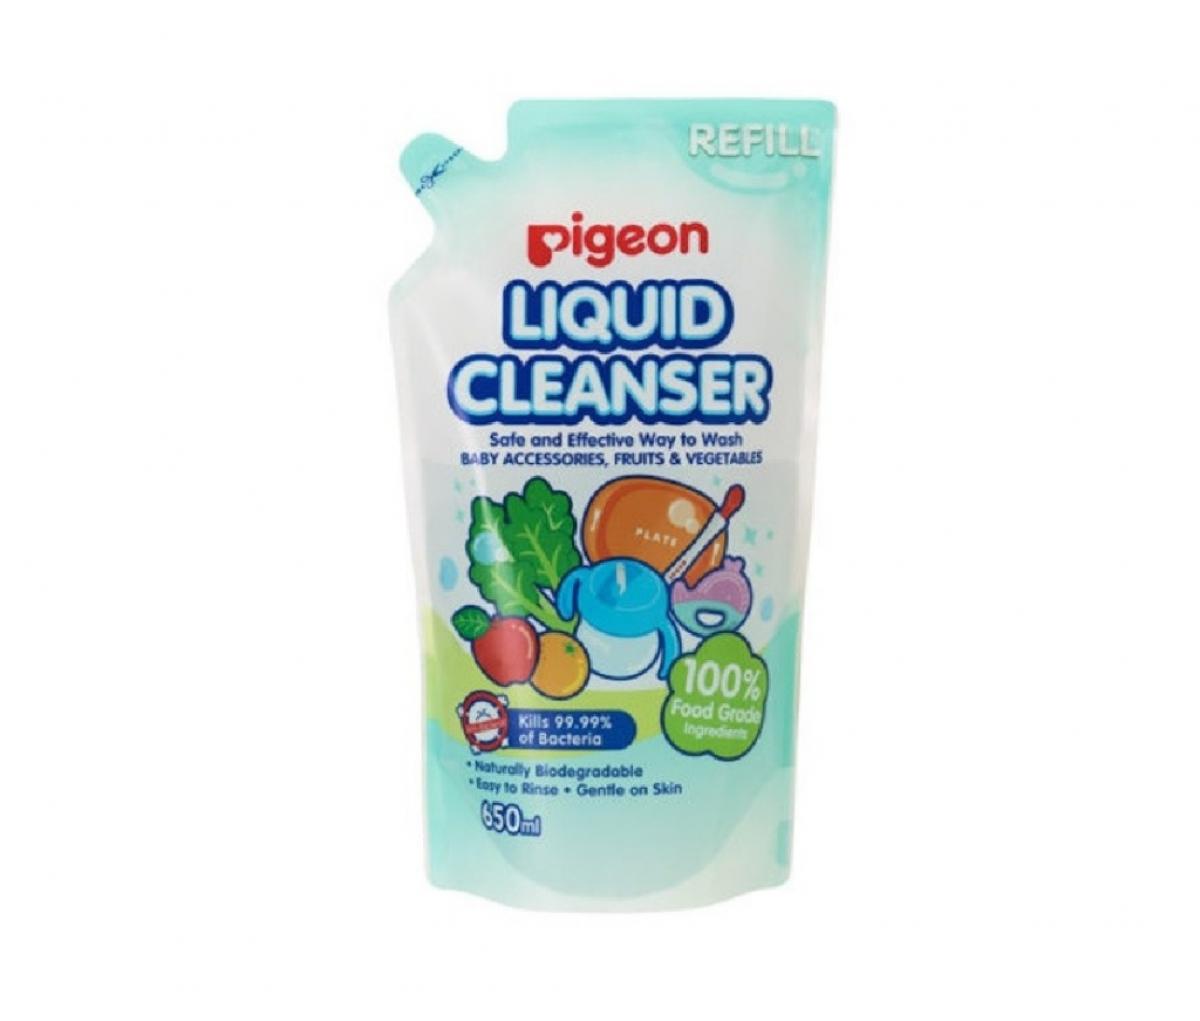 LIQUID CLEANSER REFILL, 650ML  [26601]